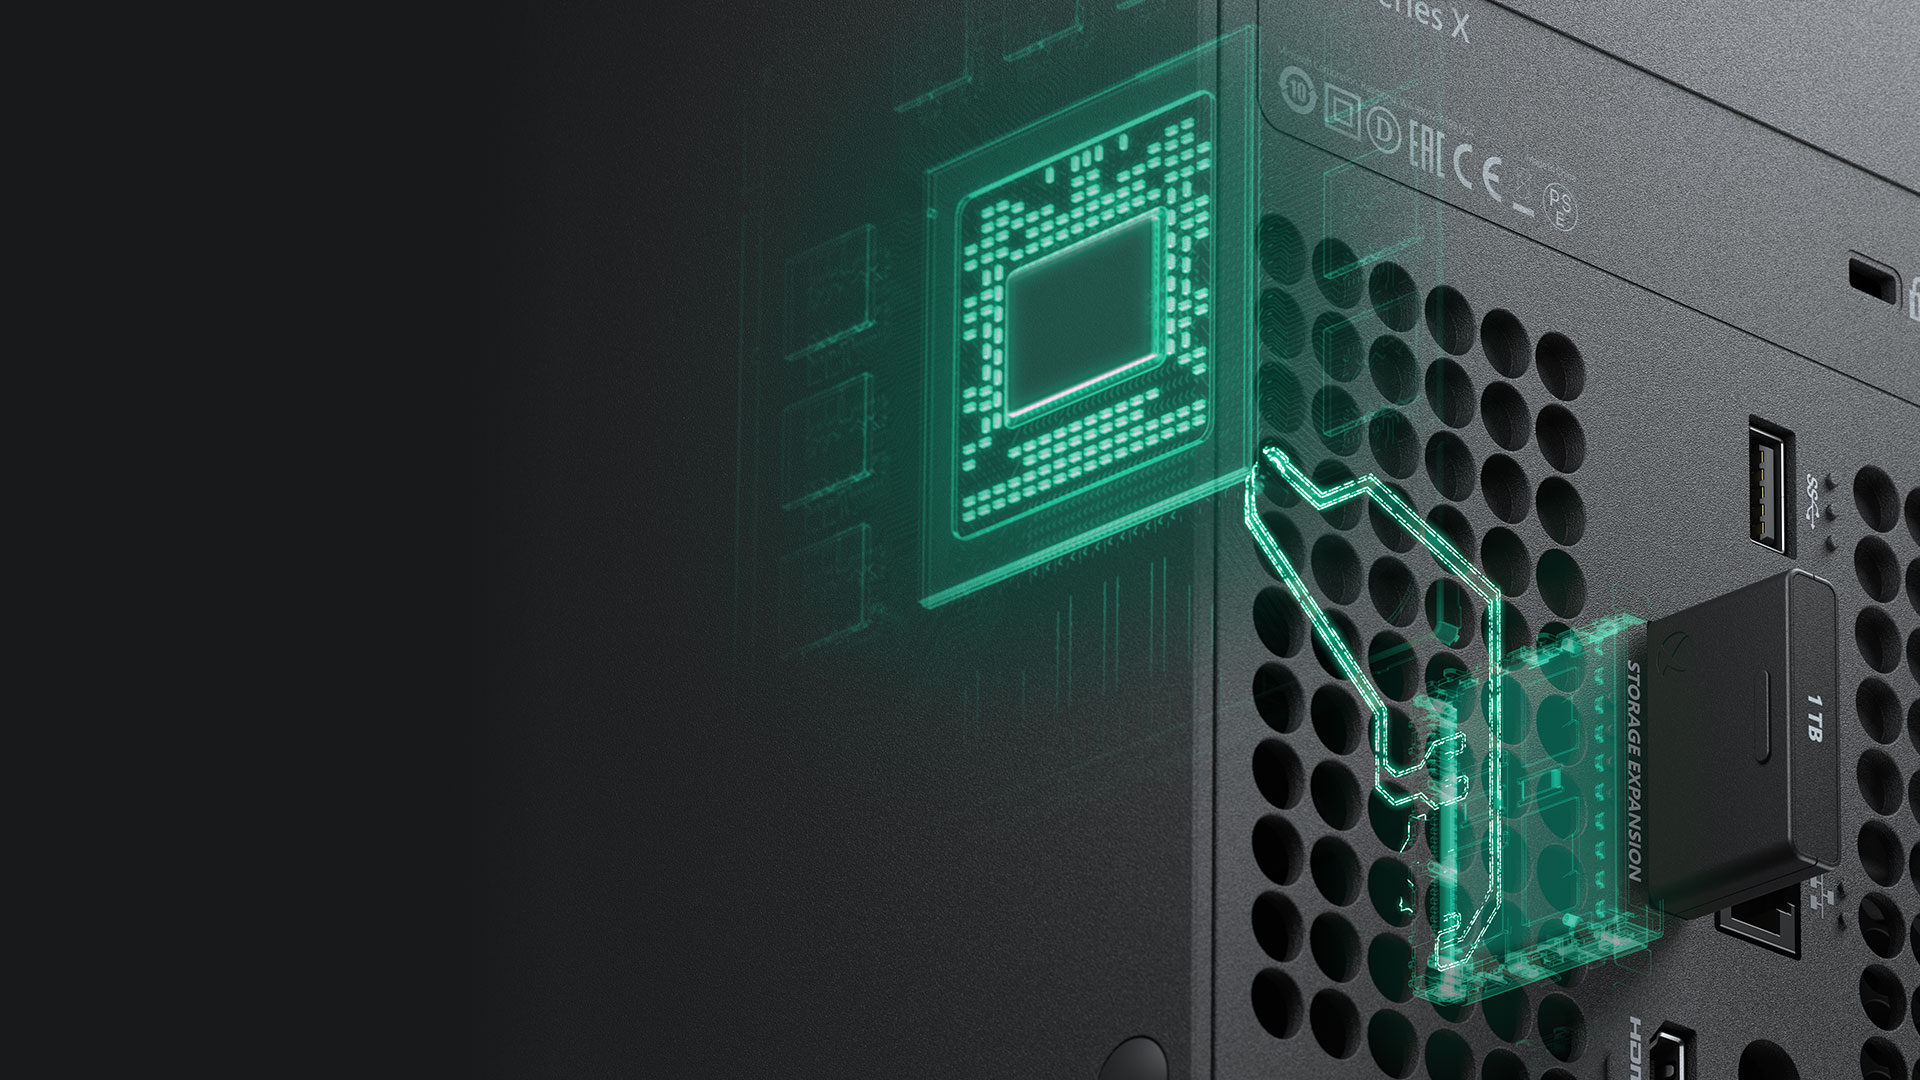 Карта памяти Seagate на 512 Гб для Xbox Series X | S существует – появилось фото